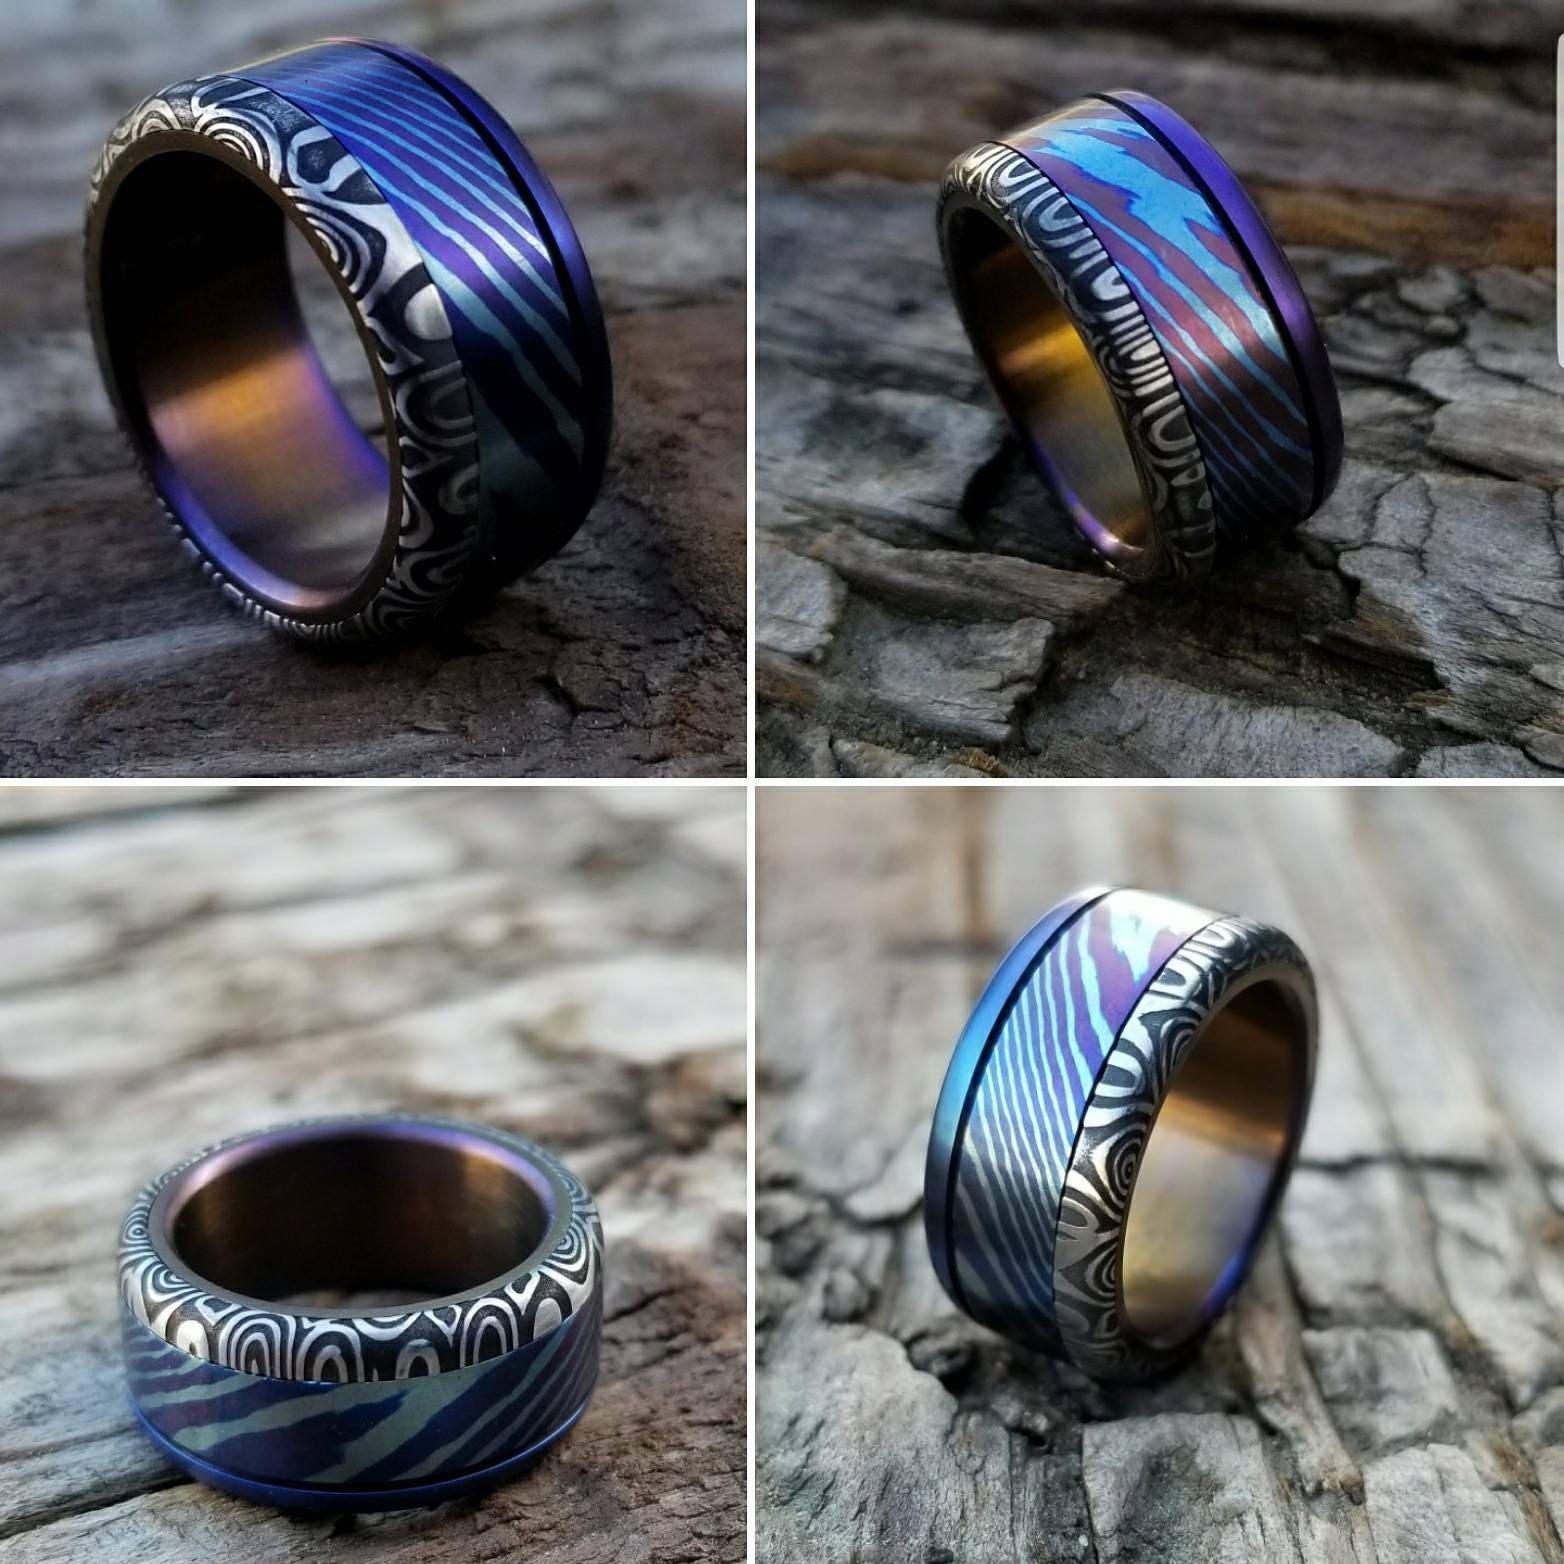 damascus ring 8mm Hawaiian Titanium lined Timascus ring Mokuti